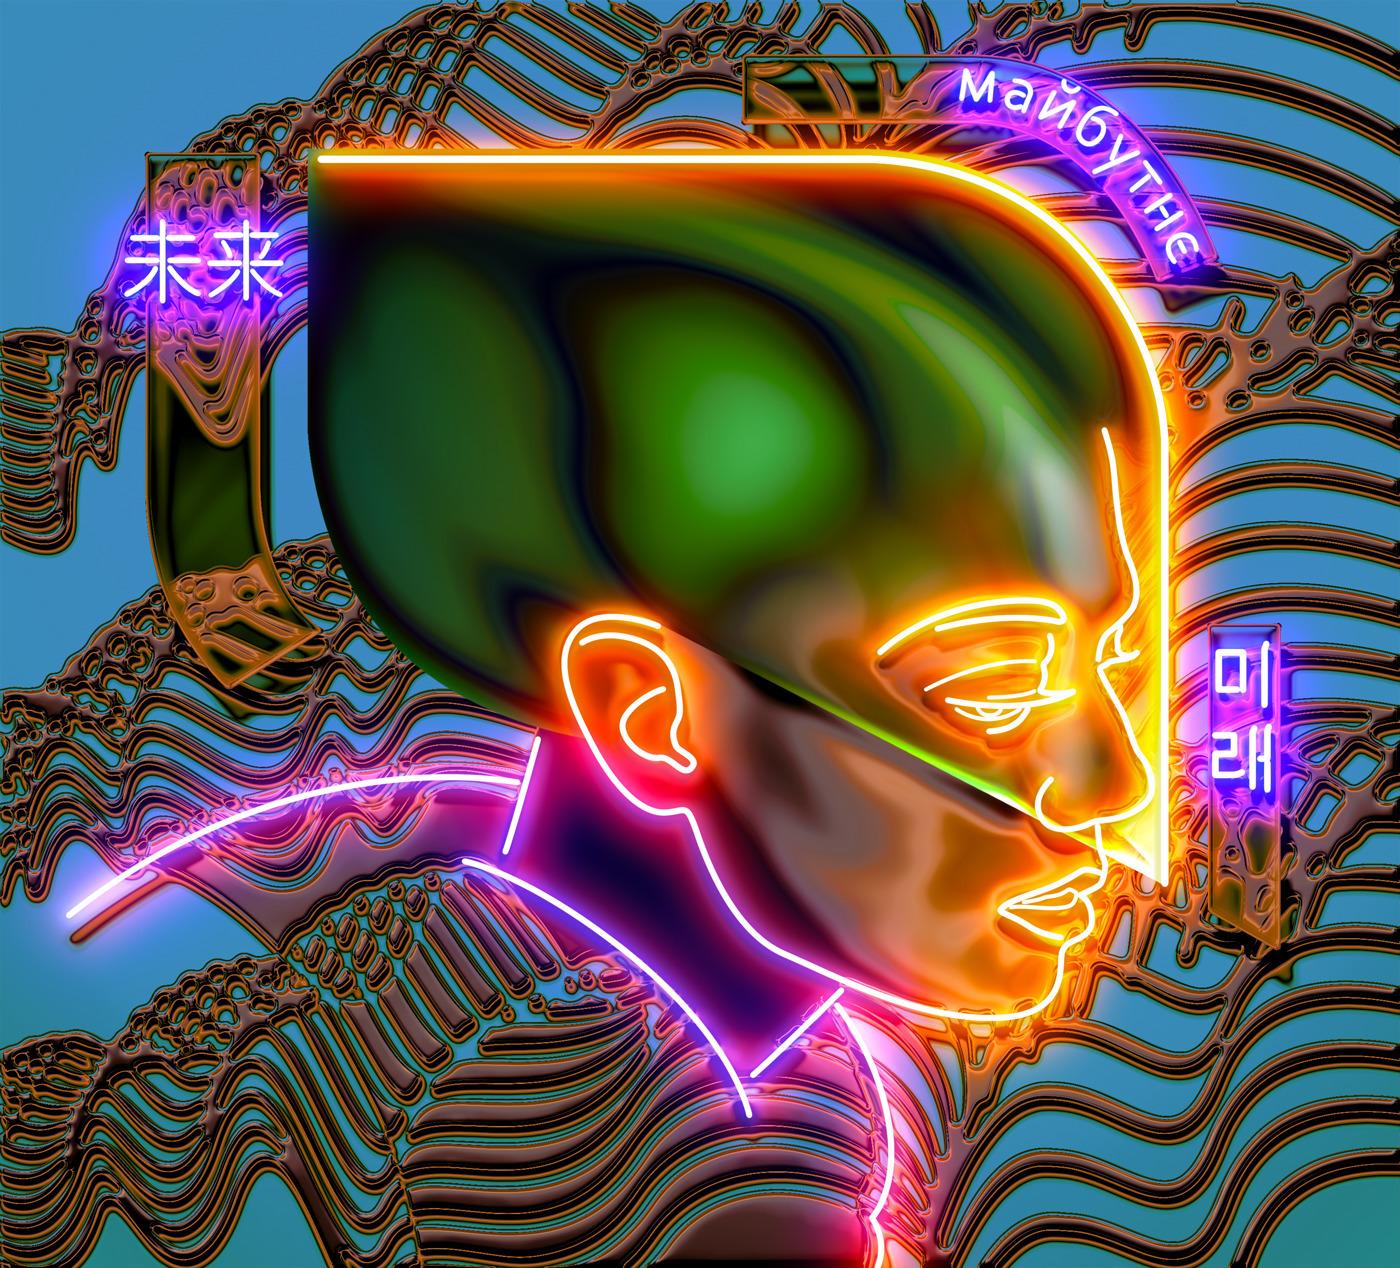 unused cover Brain magazine - neon - kolotusha   ello